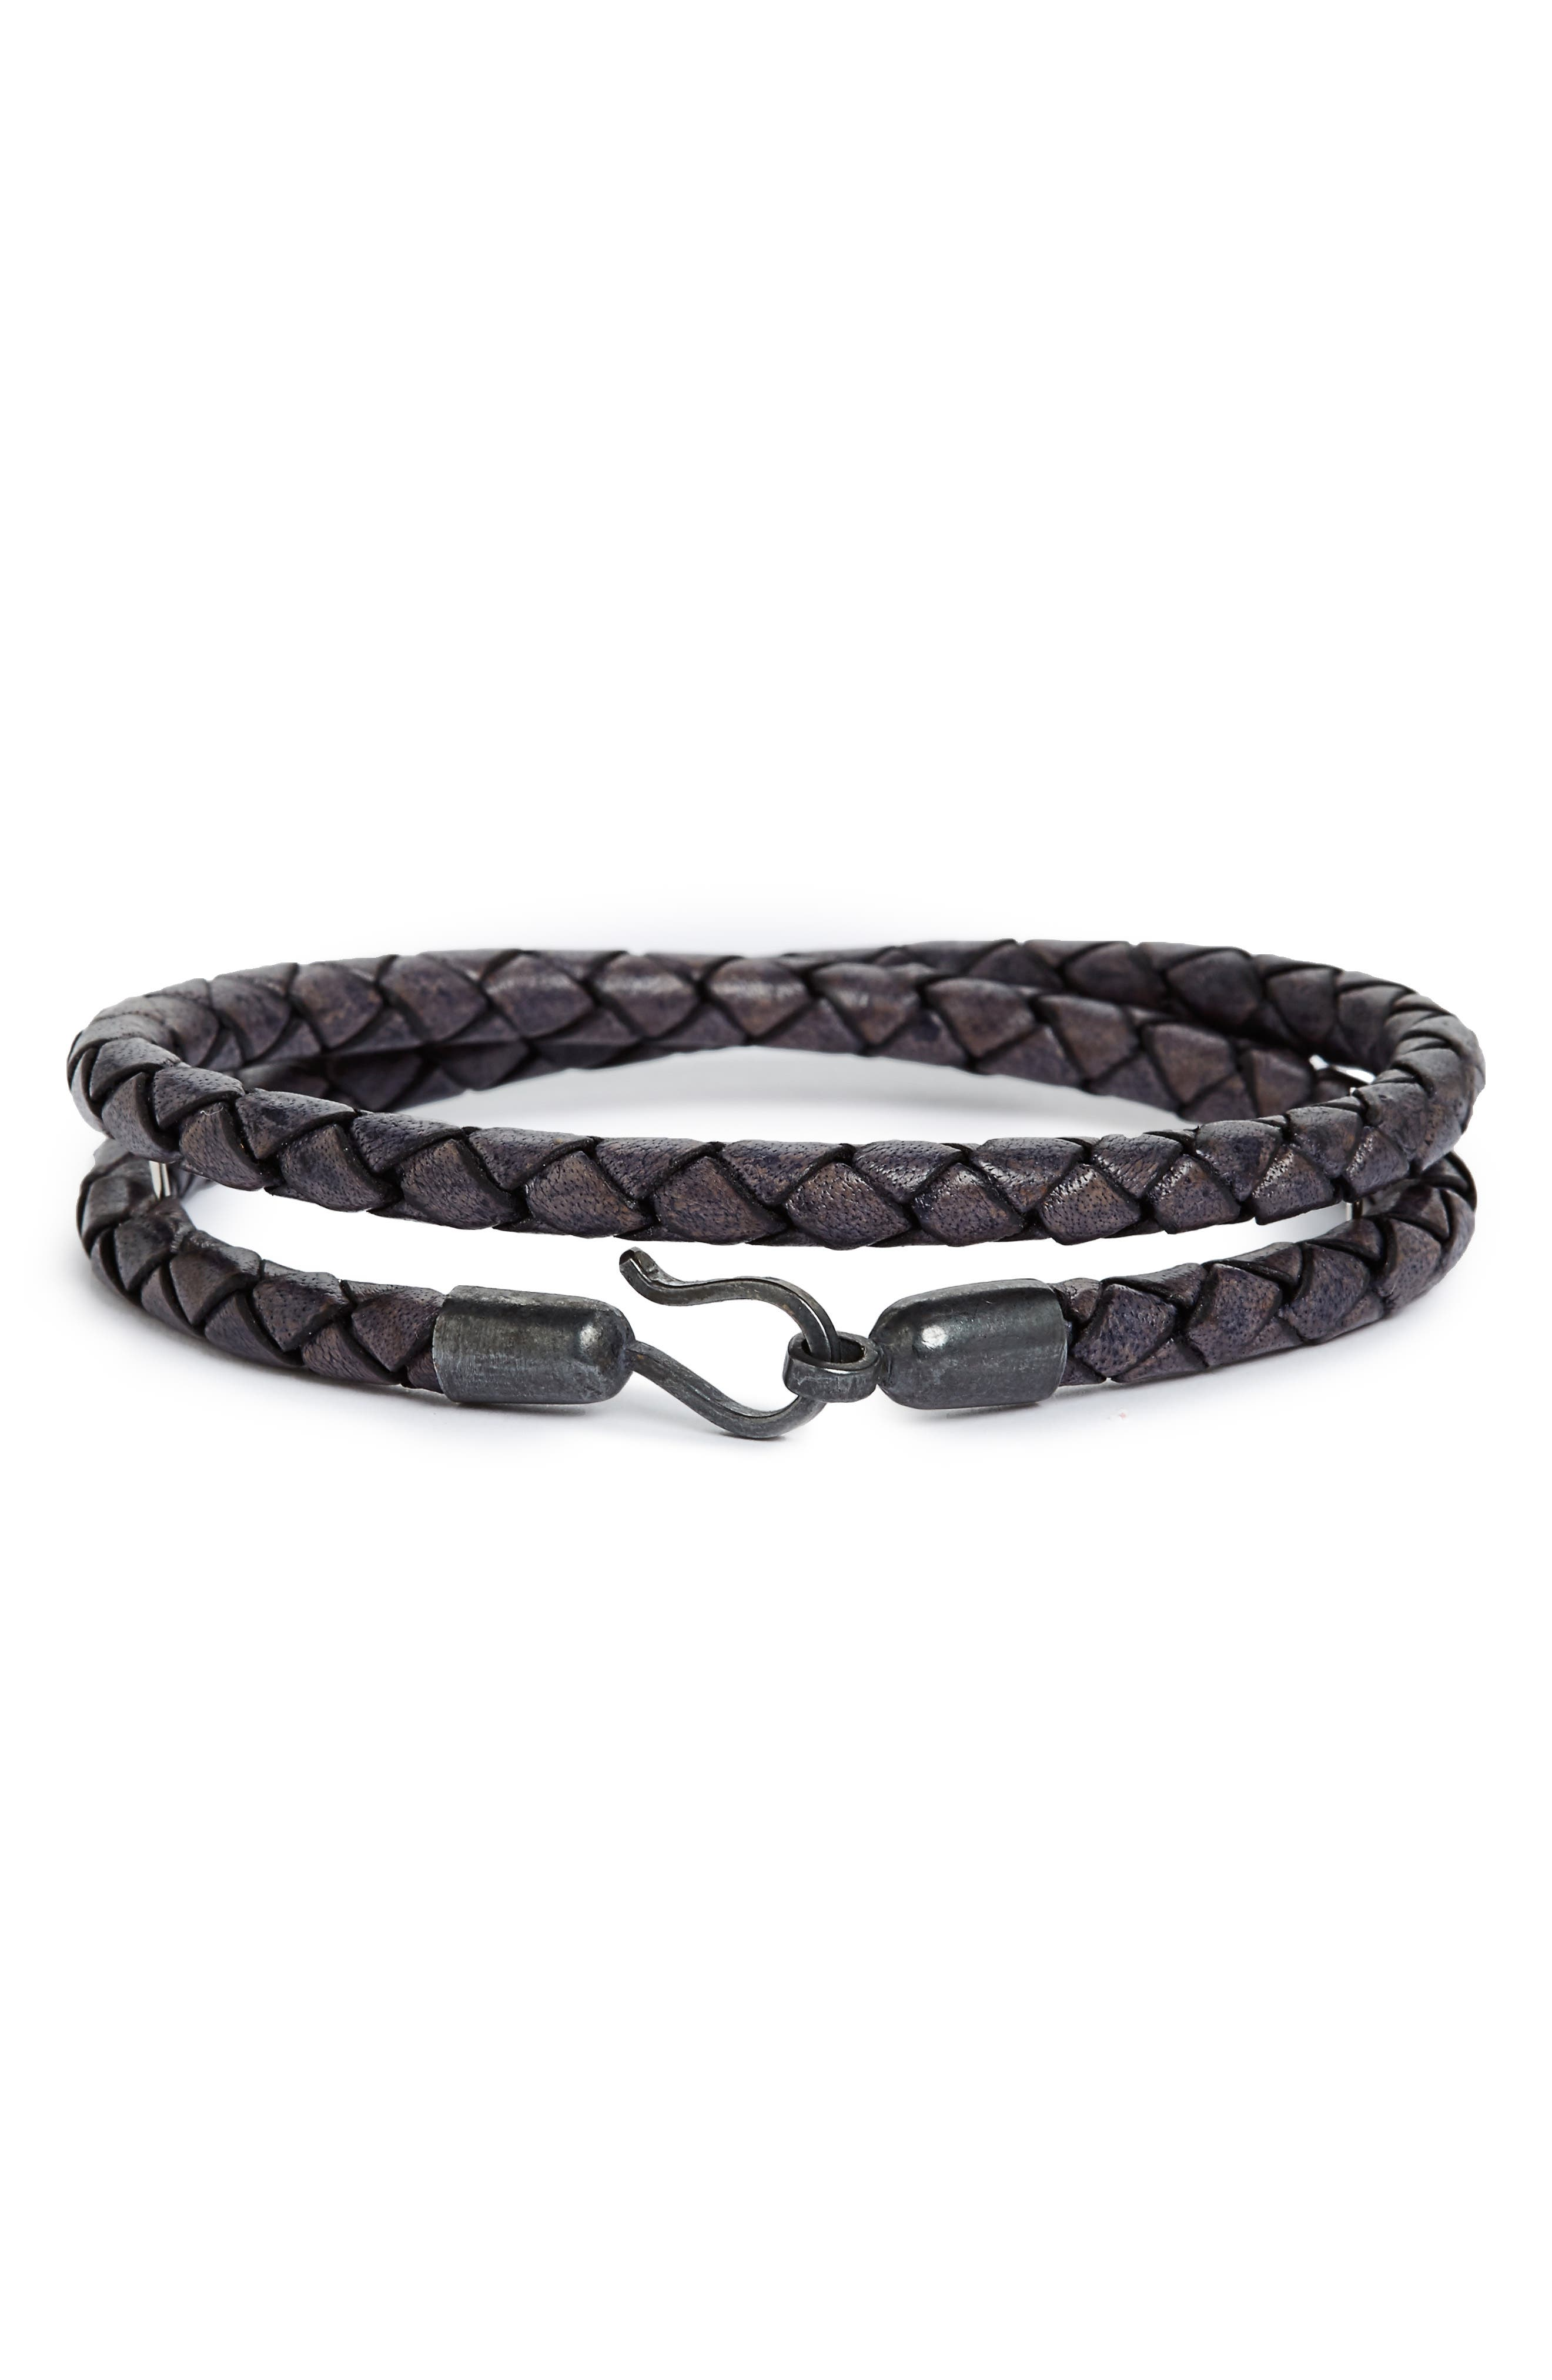 Alternate Image 1 Selected - Caputo & Co. Braided Leather Double Wrap Bracelet